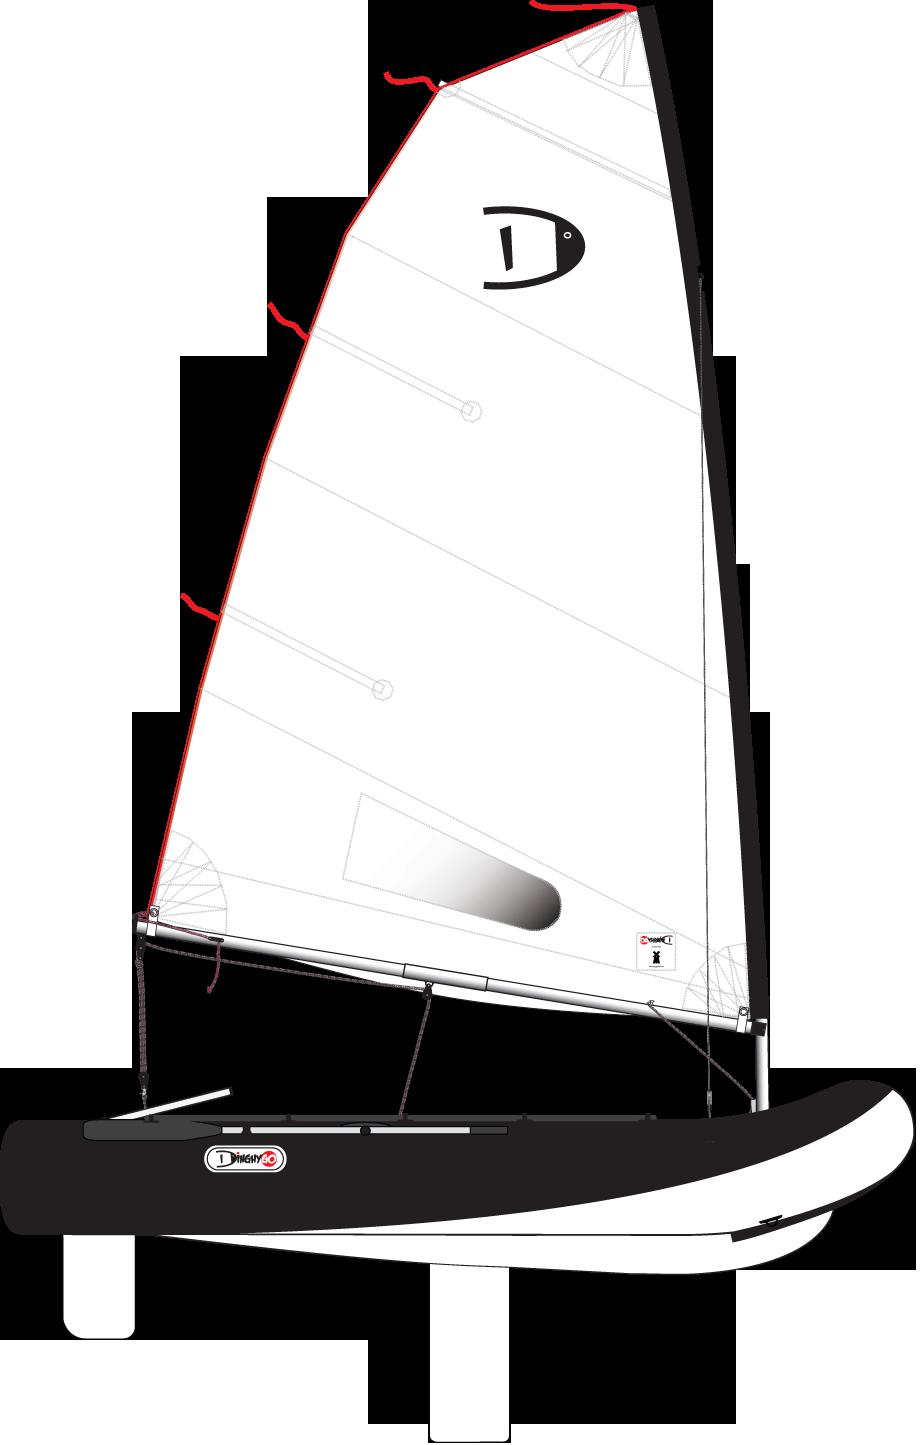 DinghyGo Orca (delivery March 2020)